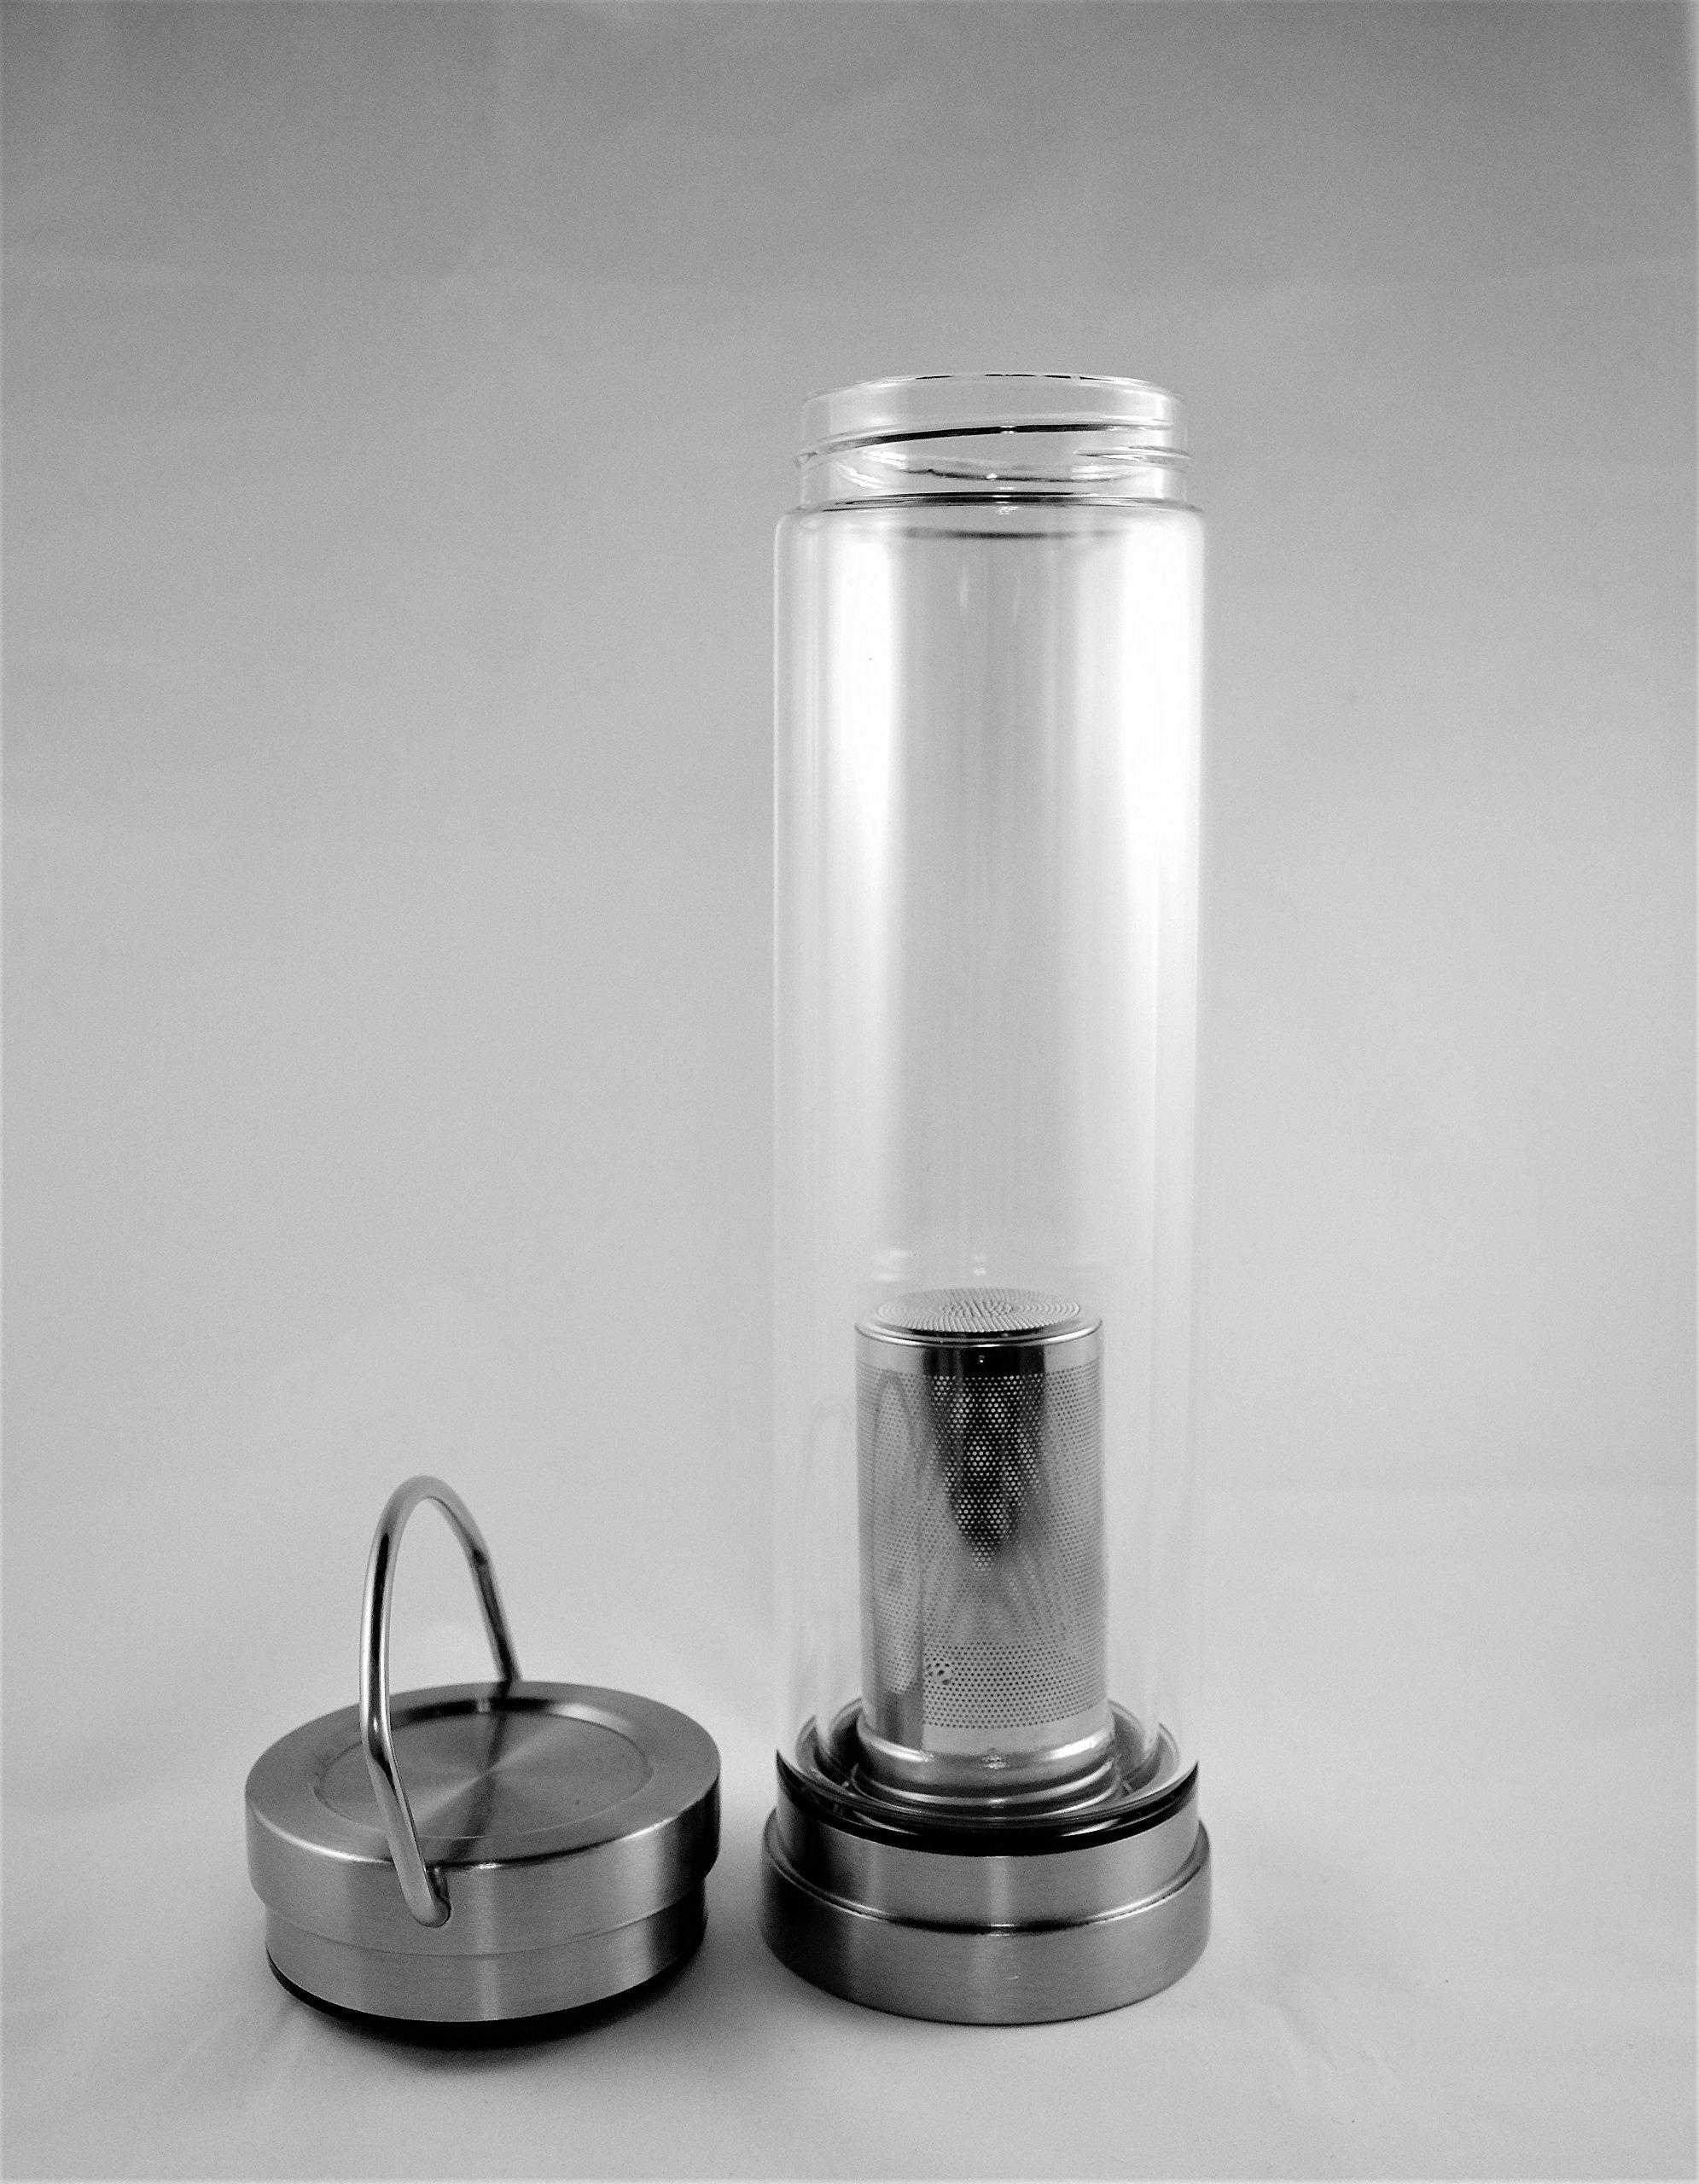 Batavia Customs House Tea Infuser - Double-Walled Glass Tea Bottle with Infusion Chamber by Batavia Customs House